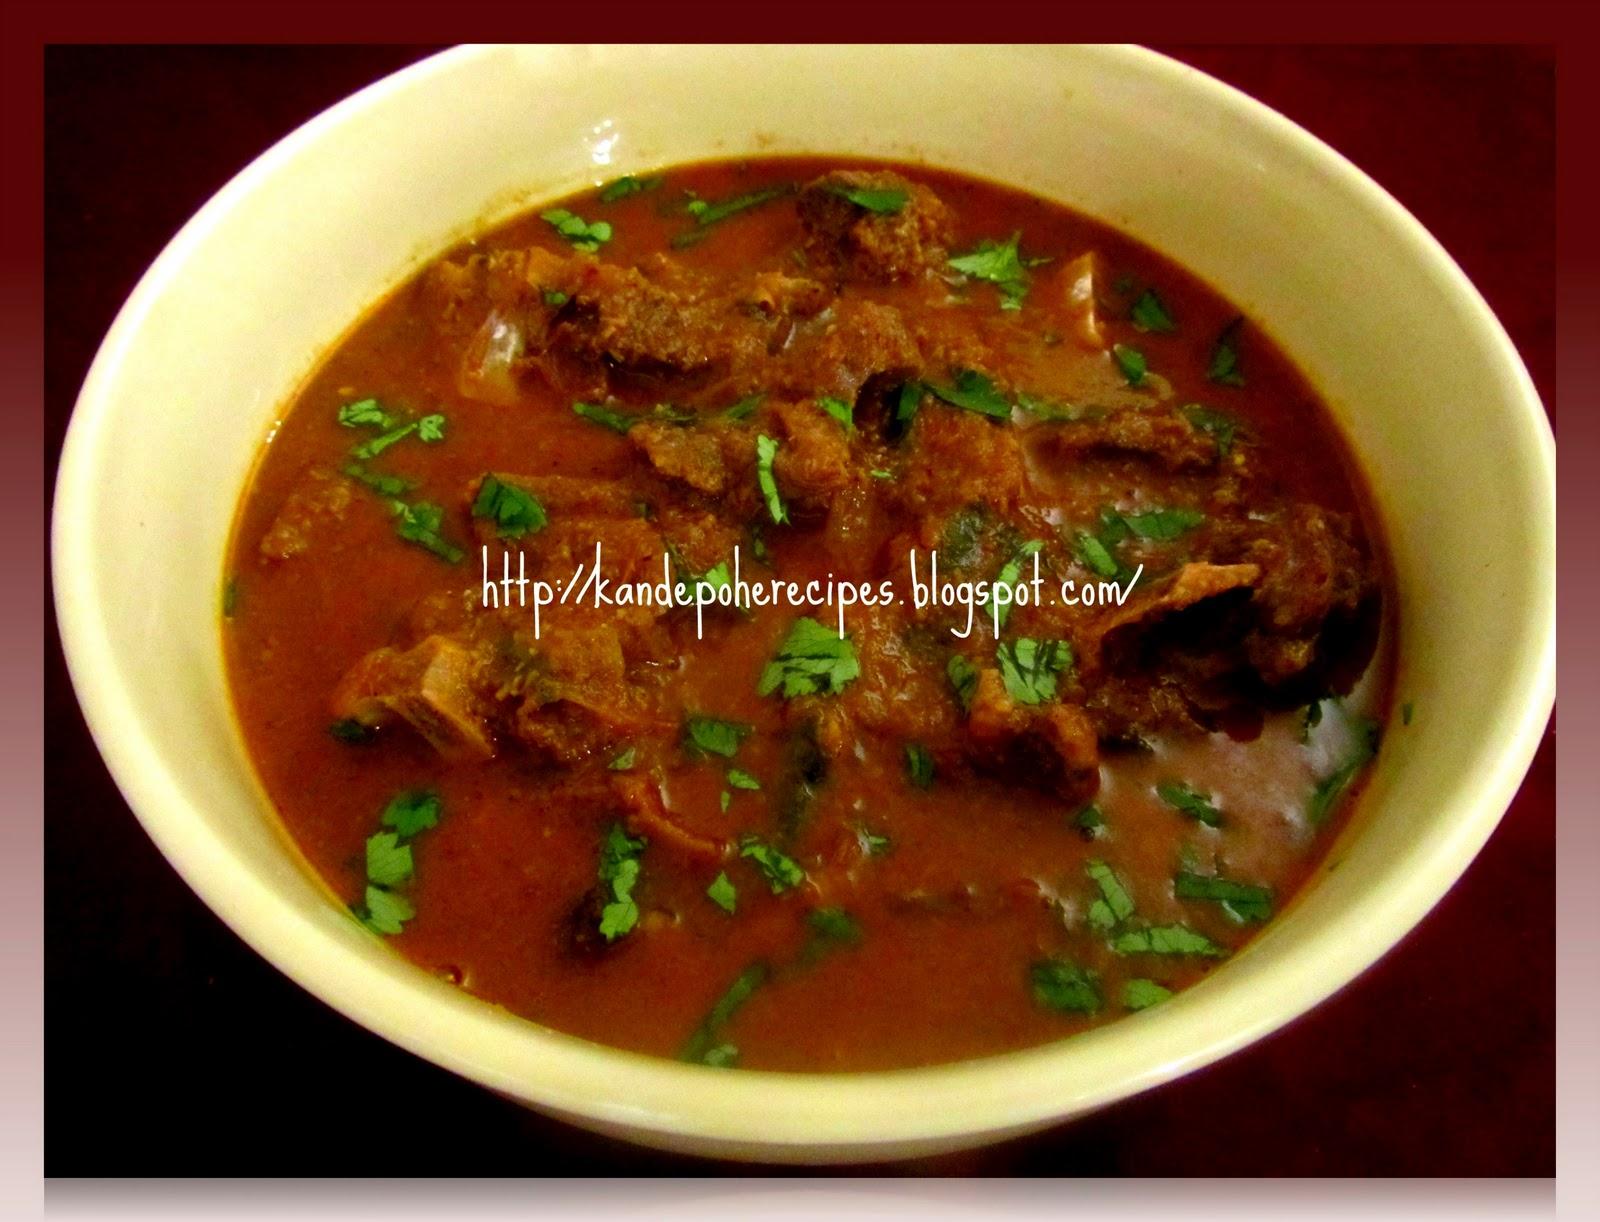 lamb curry / Kolhapuri tambda rassa / Spicy Mutton Curry / Mutton ...